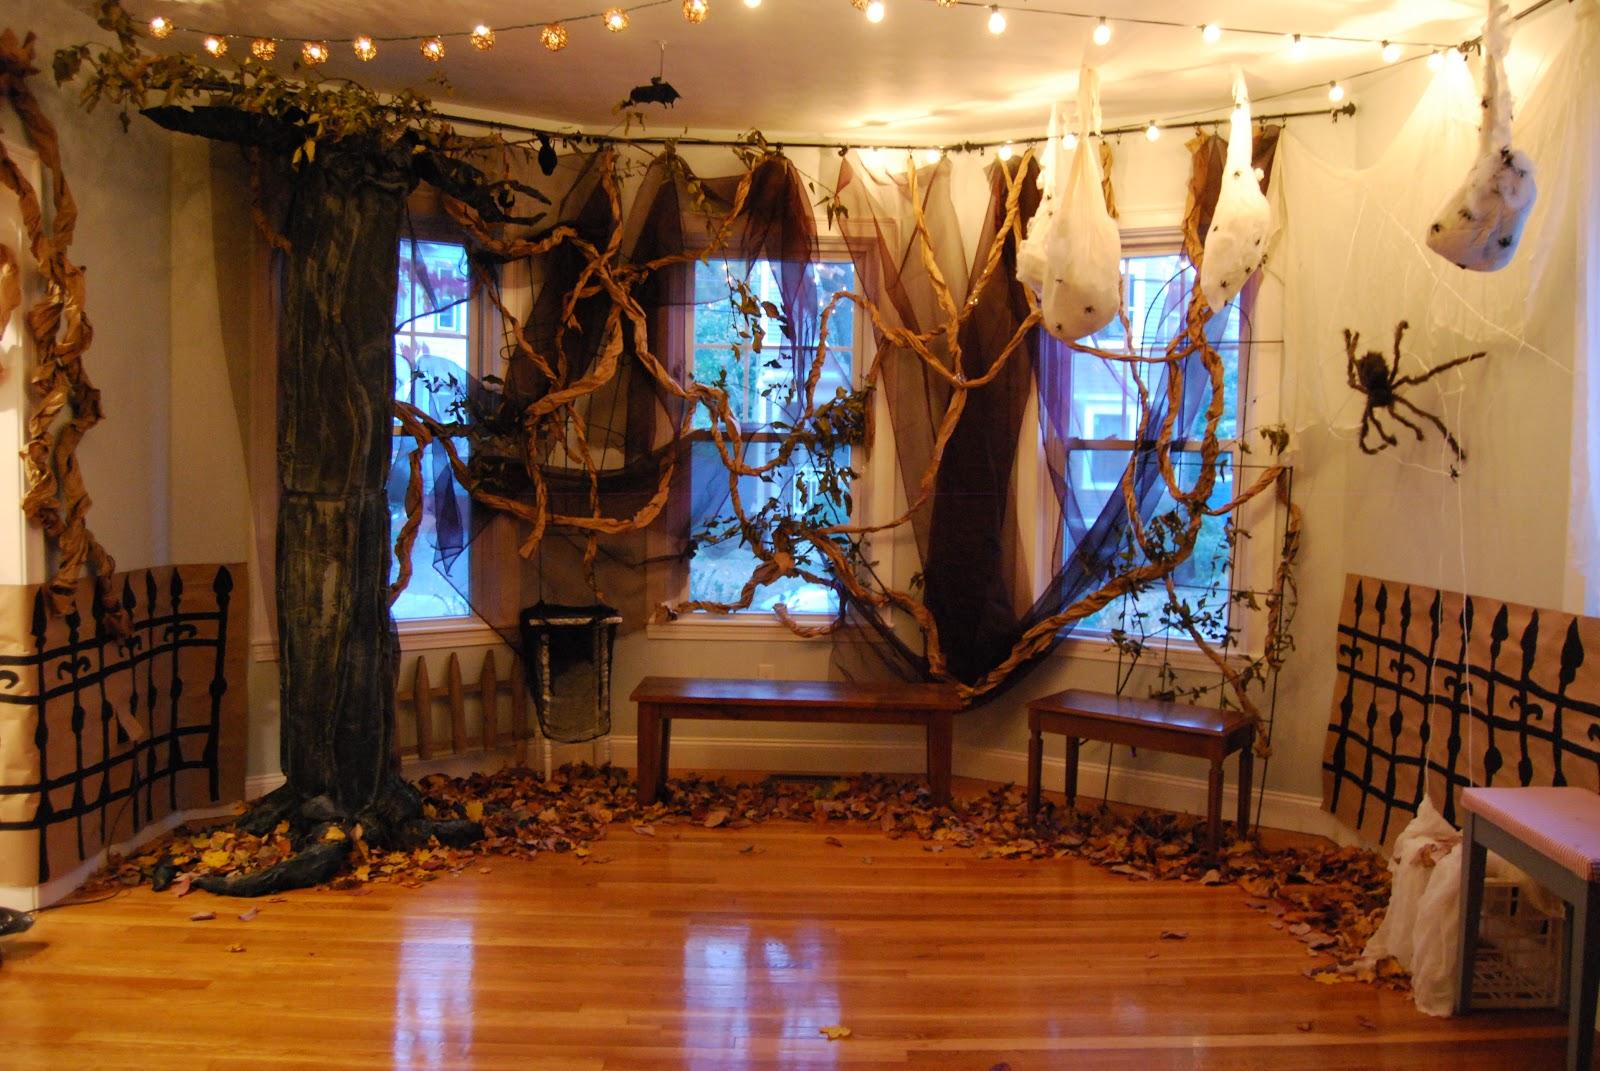 Indoor halloween party decorations - The Salad Days 5th Annual Donigard Halloween Party The Decorations Part 1